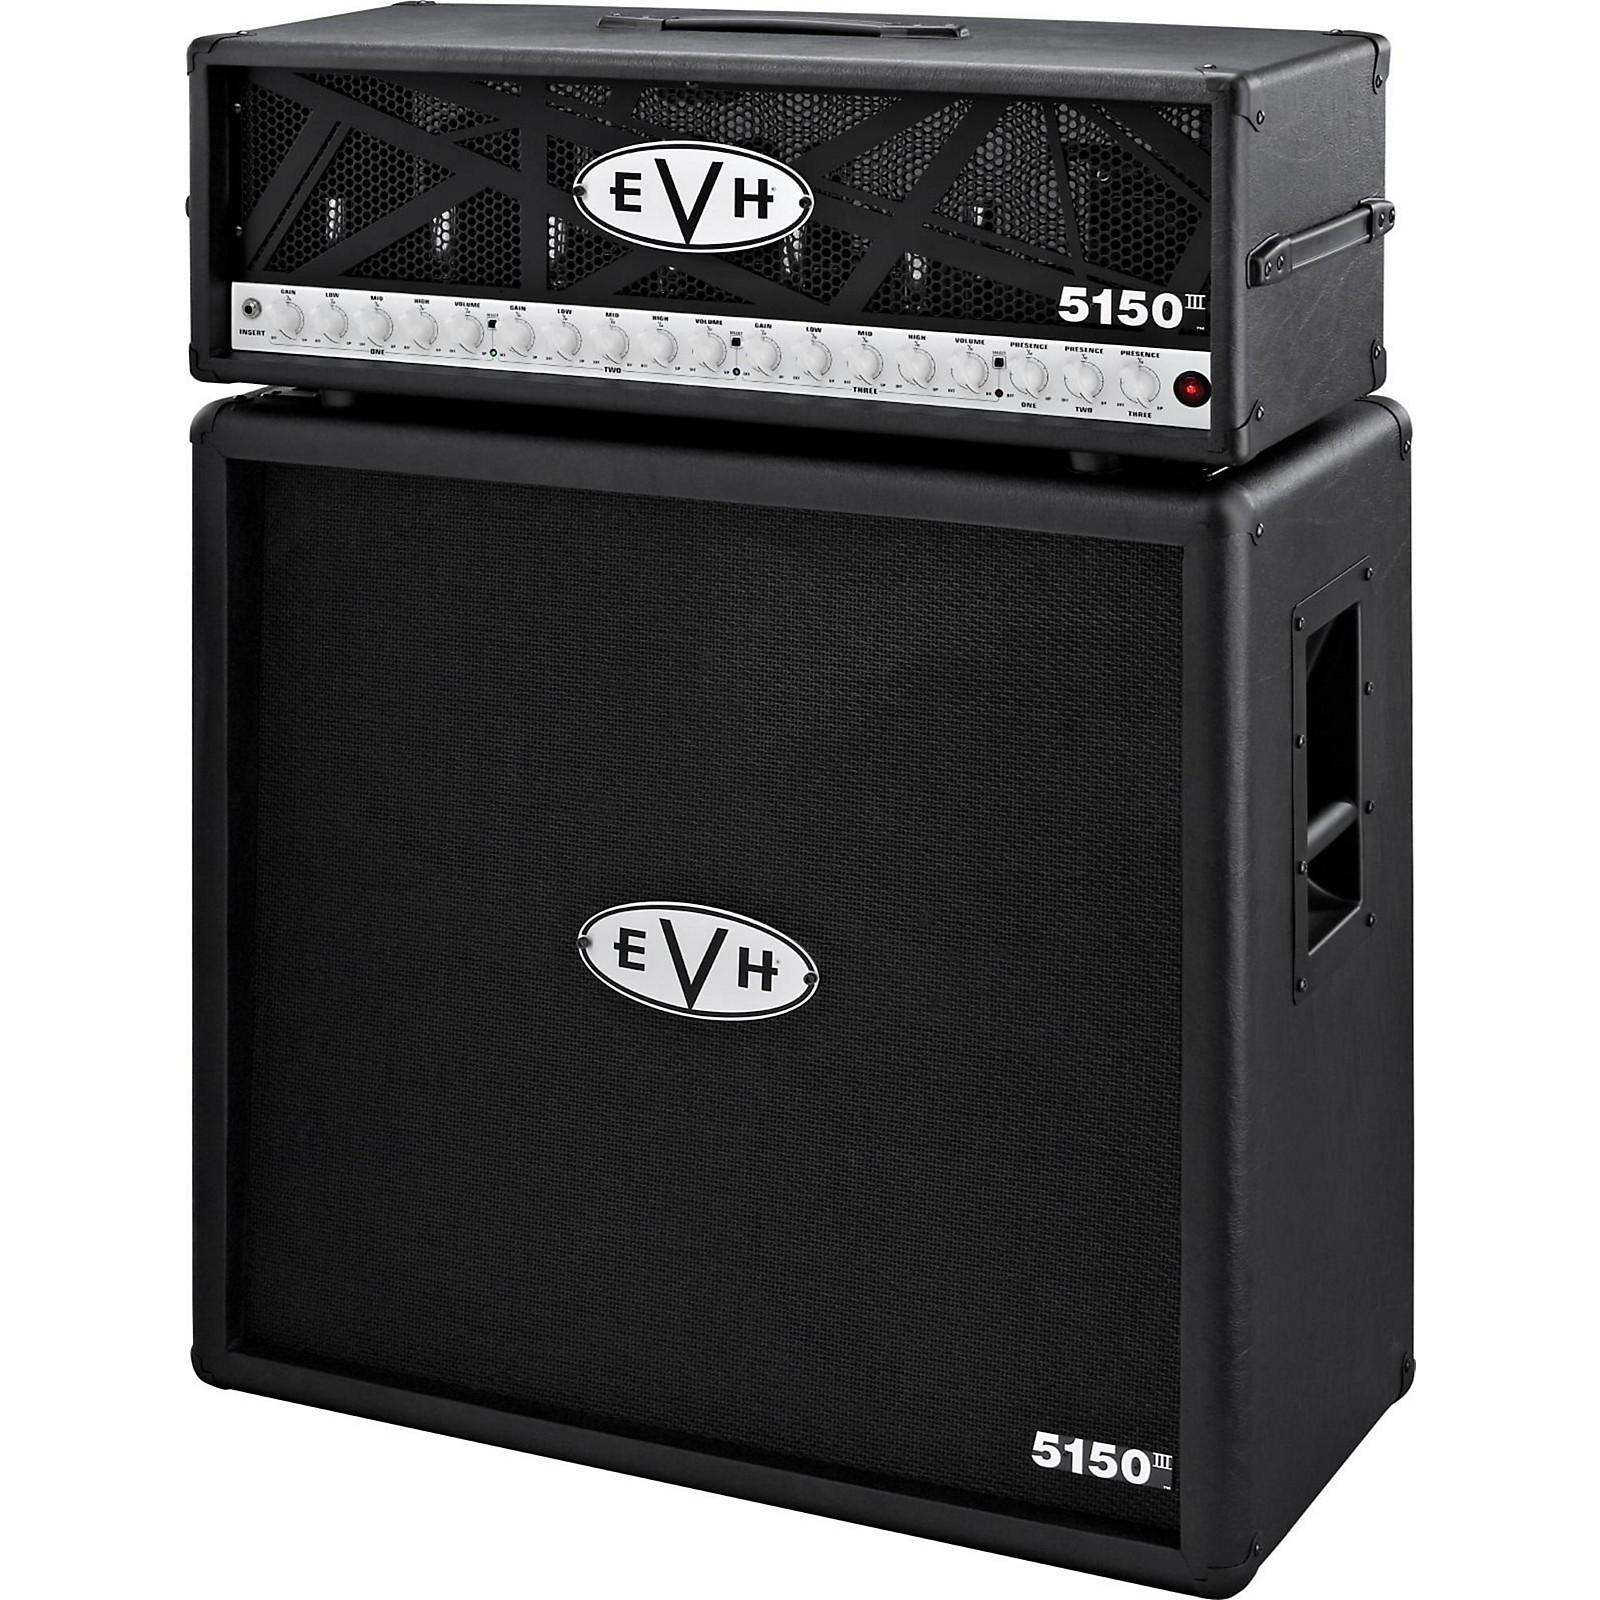 EVH 5150 III 100W Guitar Tube Head Black with 5150 III 412 Guitar Cab Black